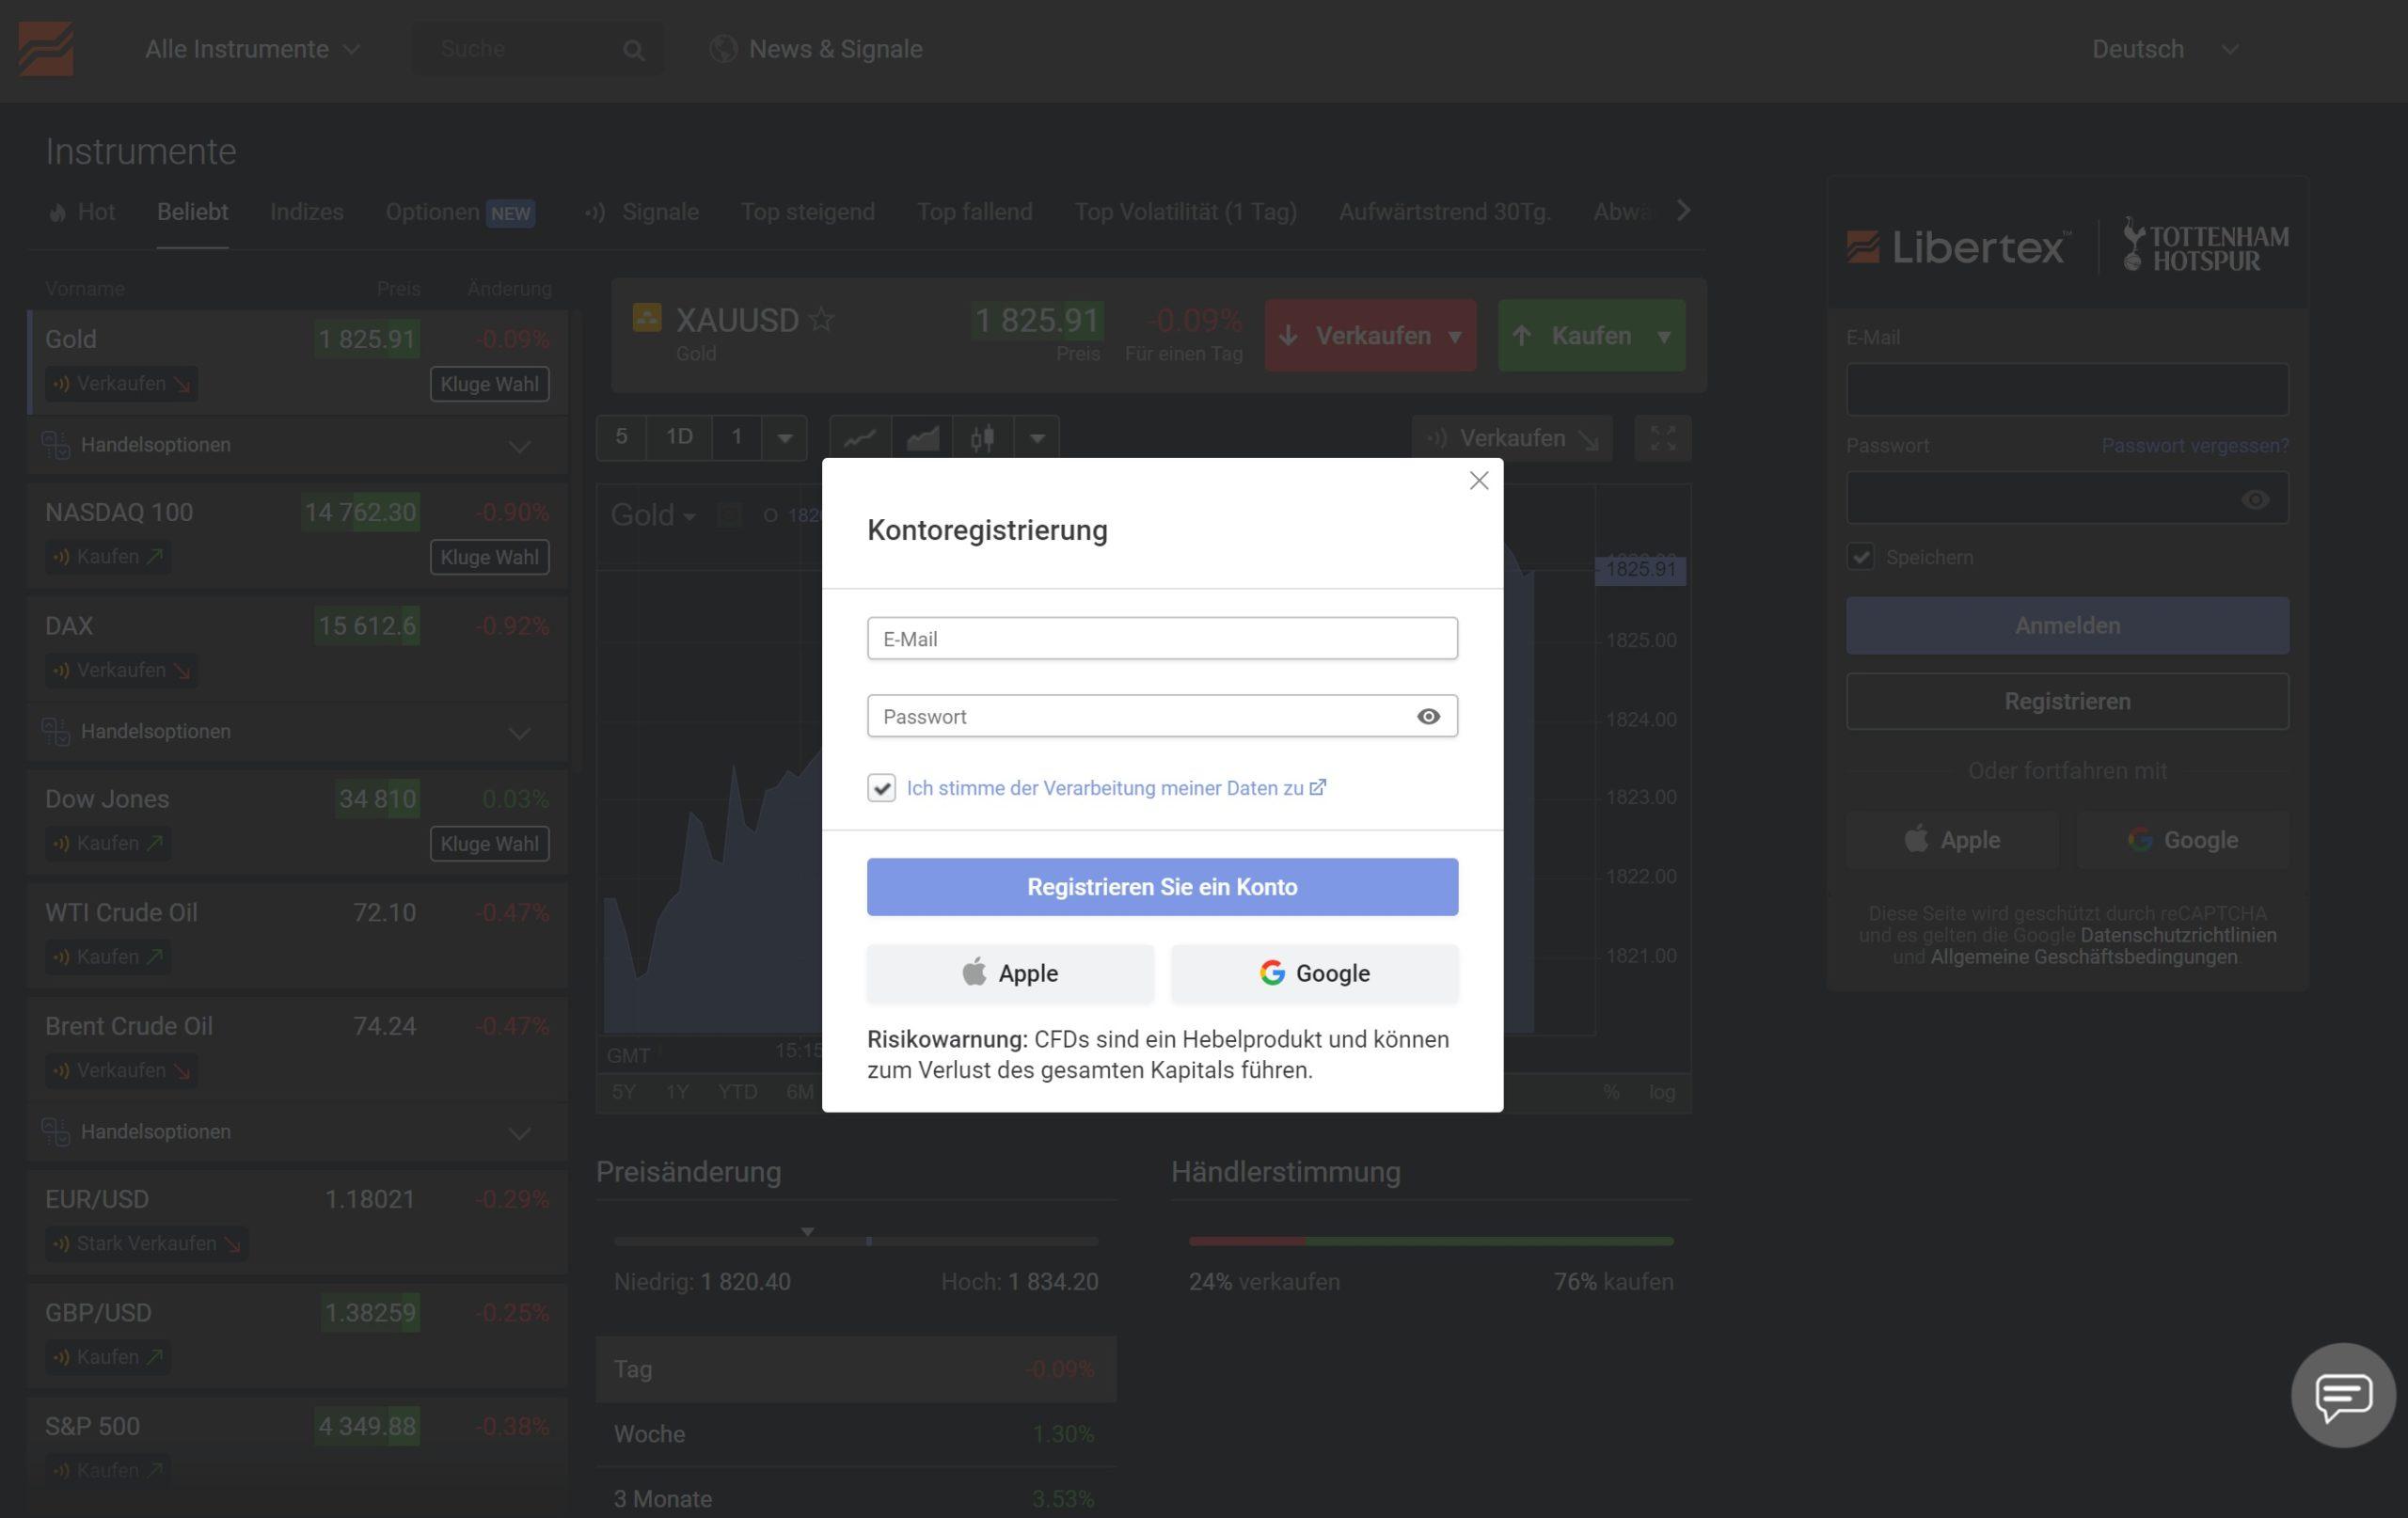 Trading Account Registrierung